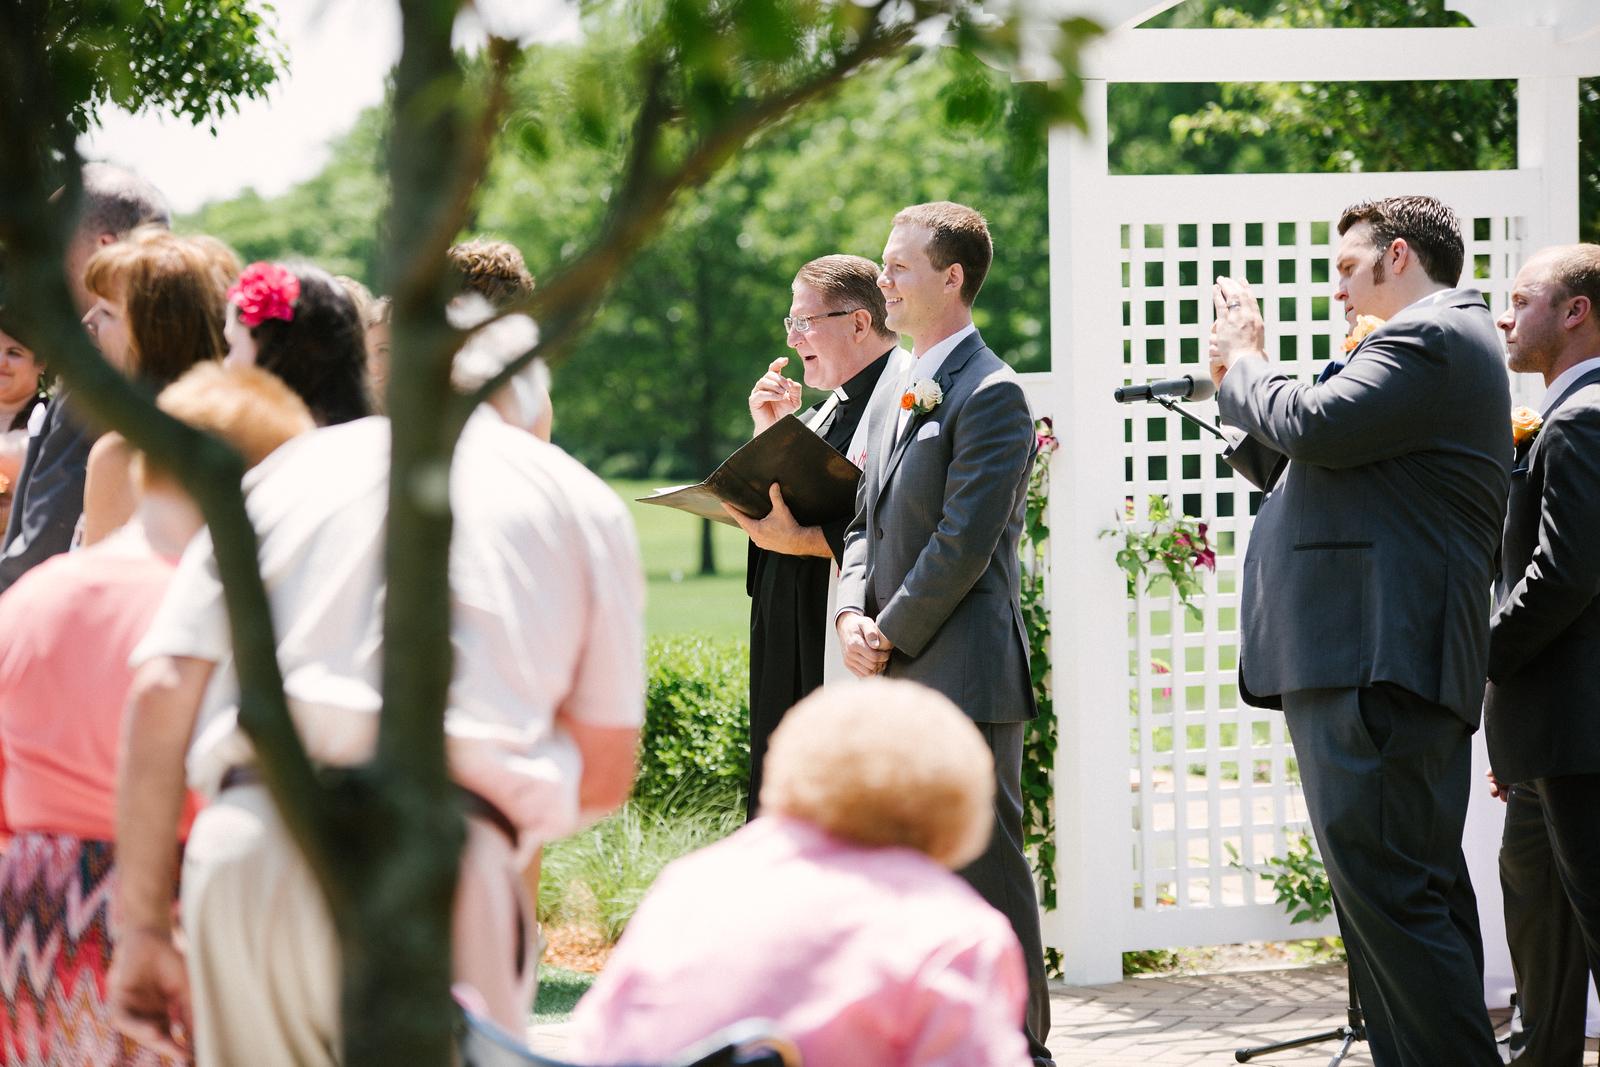 Danada House mansion outdoor garden wedding ceremony